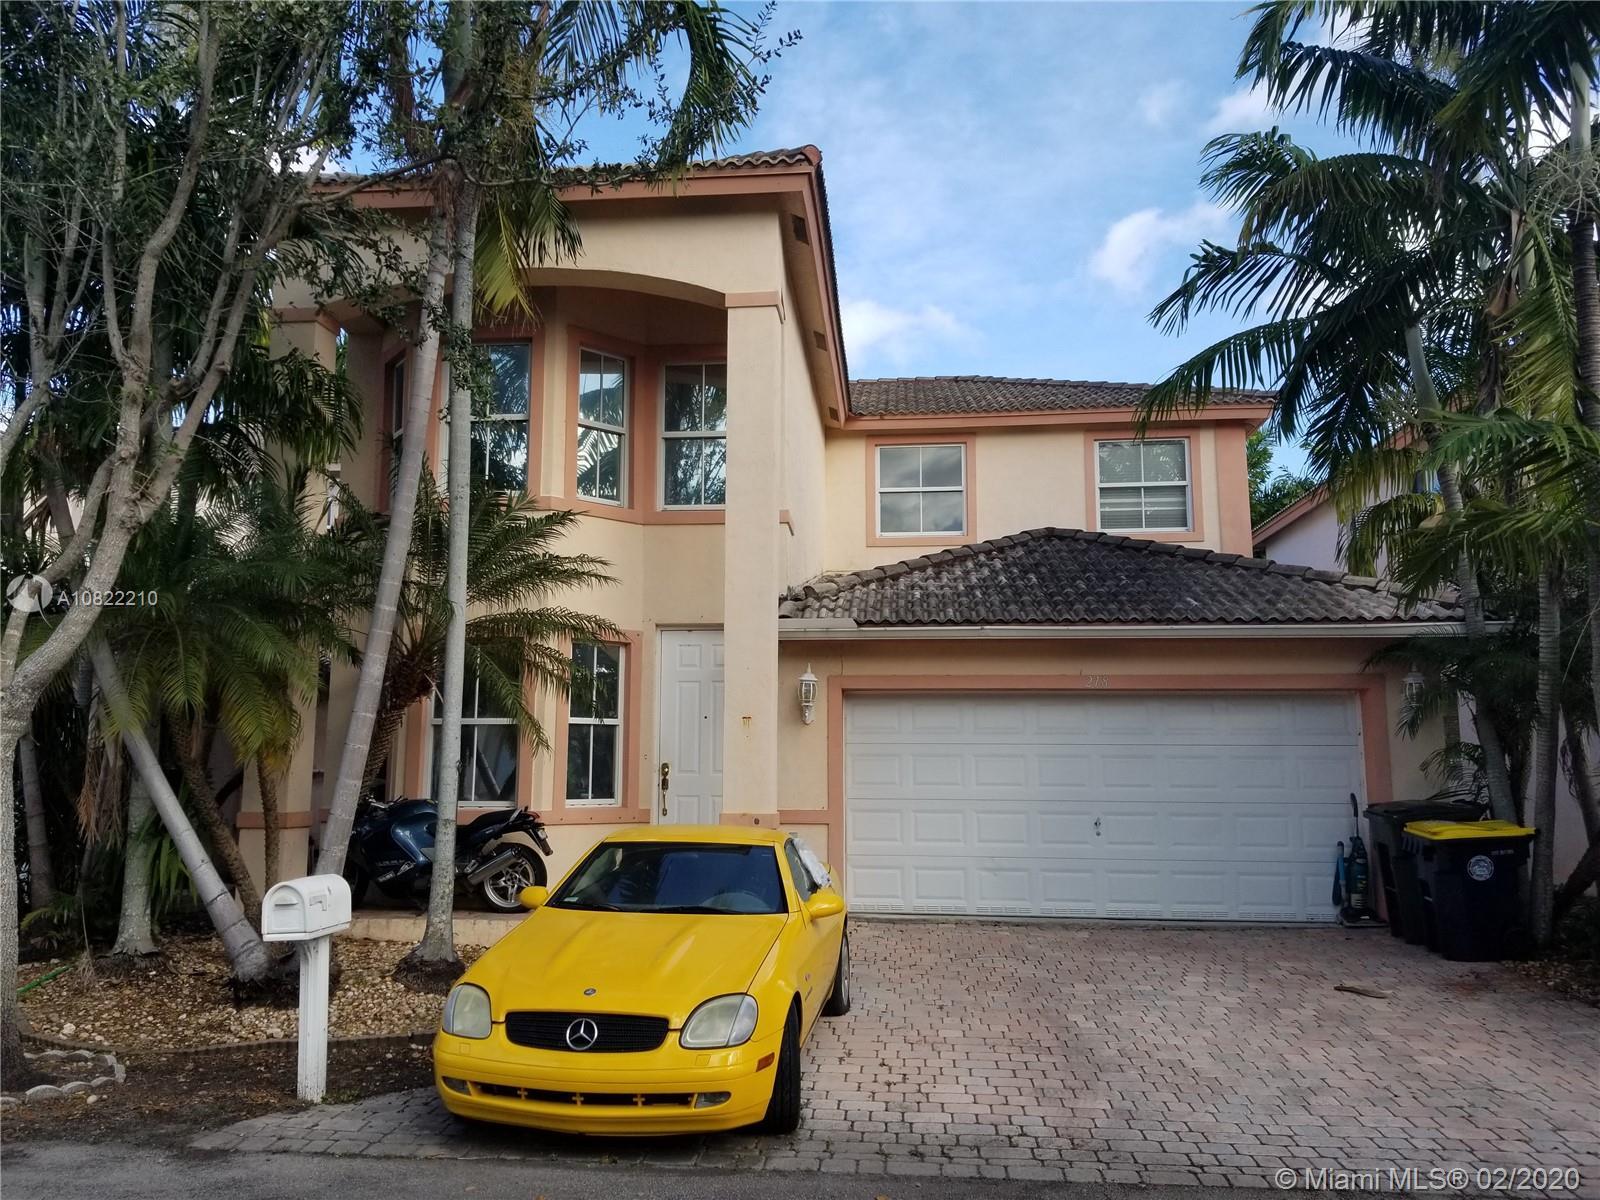 218 SE 15th St, Dania Beach, FL 33004